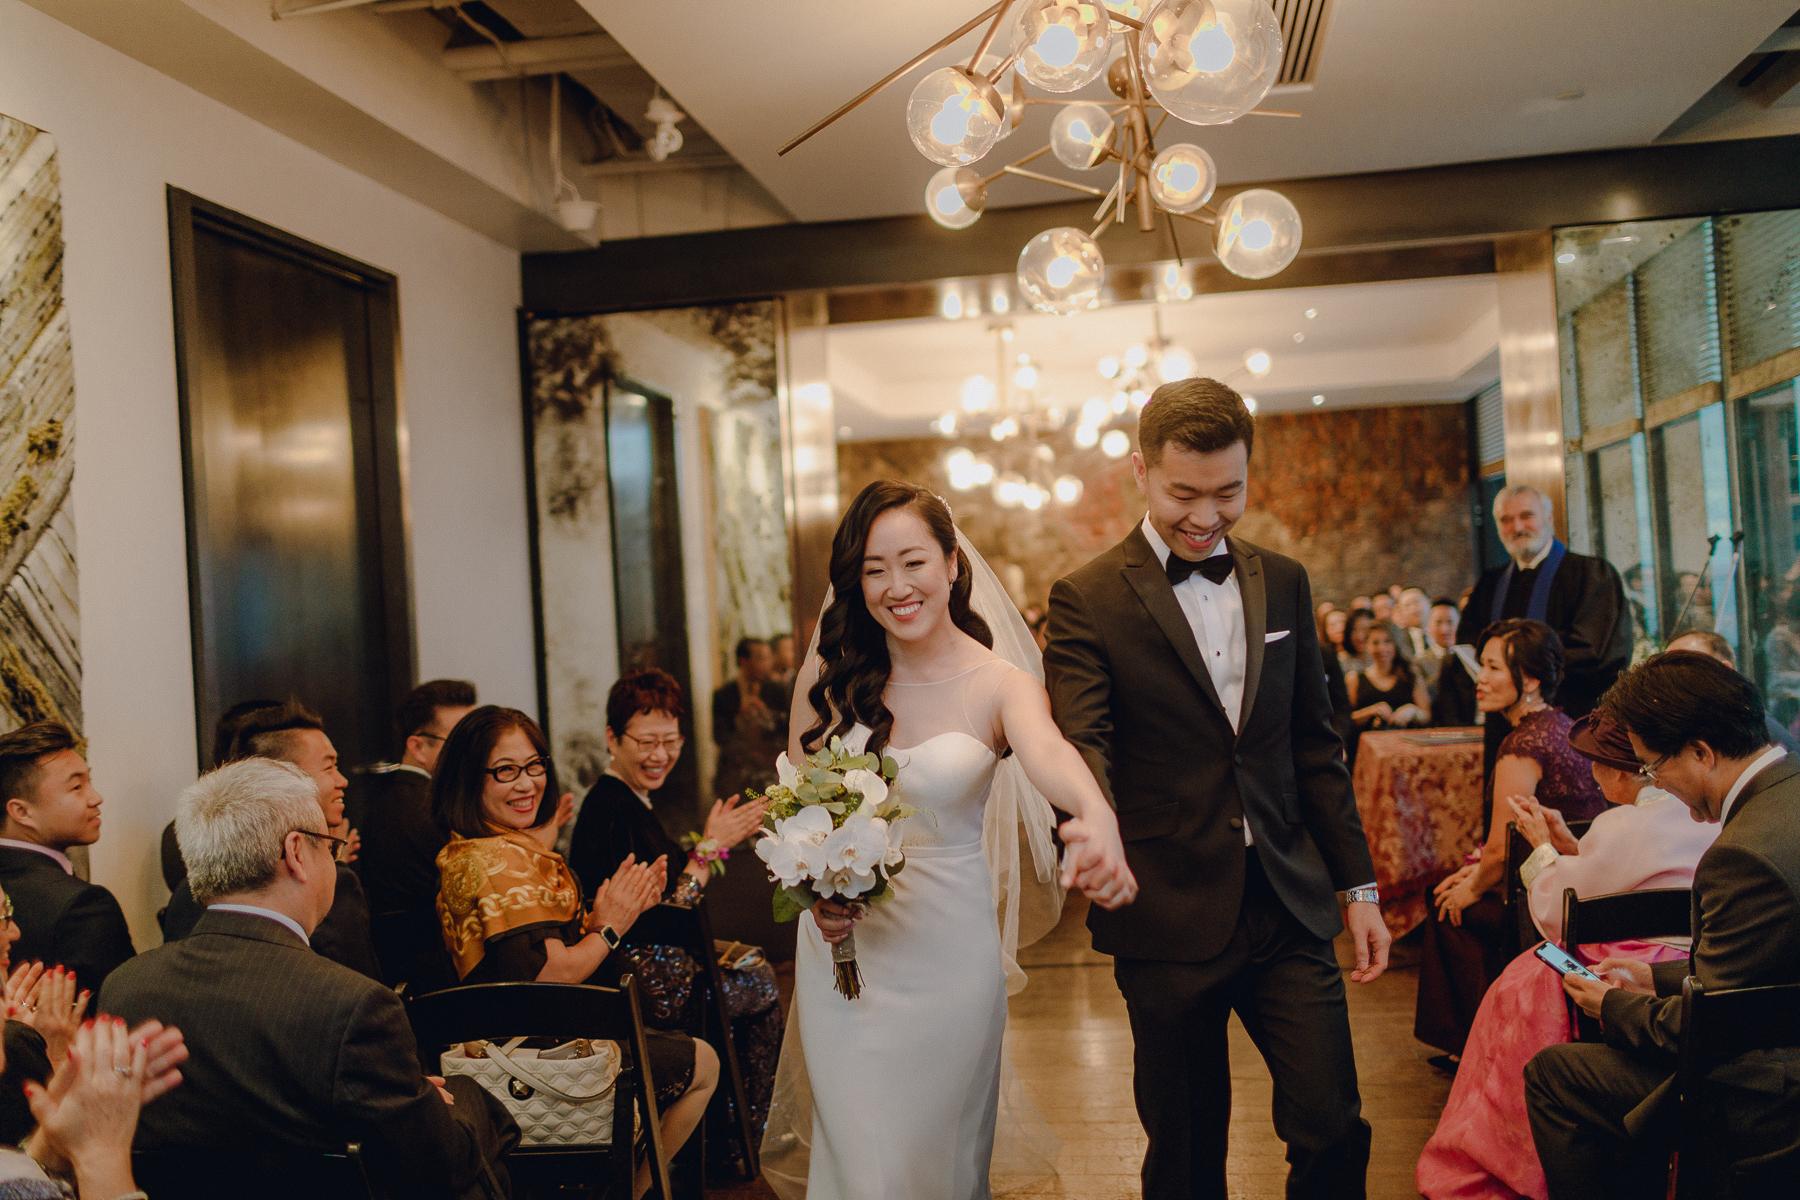 cannoe-restaurannt-wedding 0059.jpg